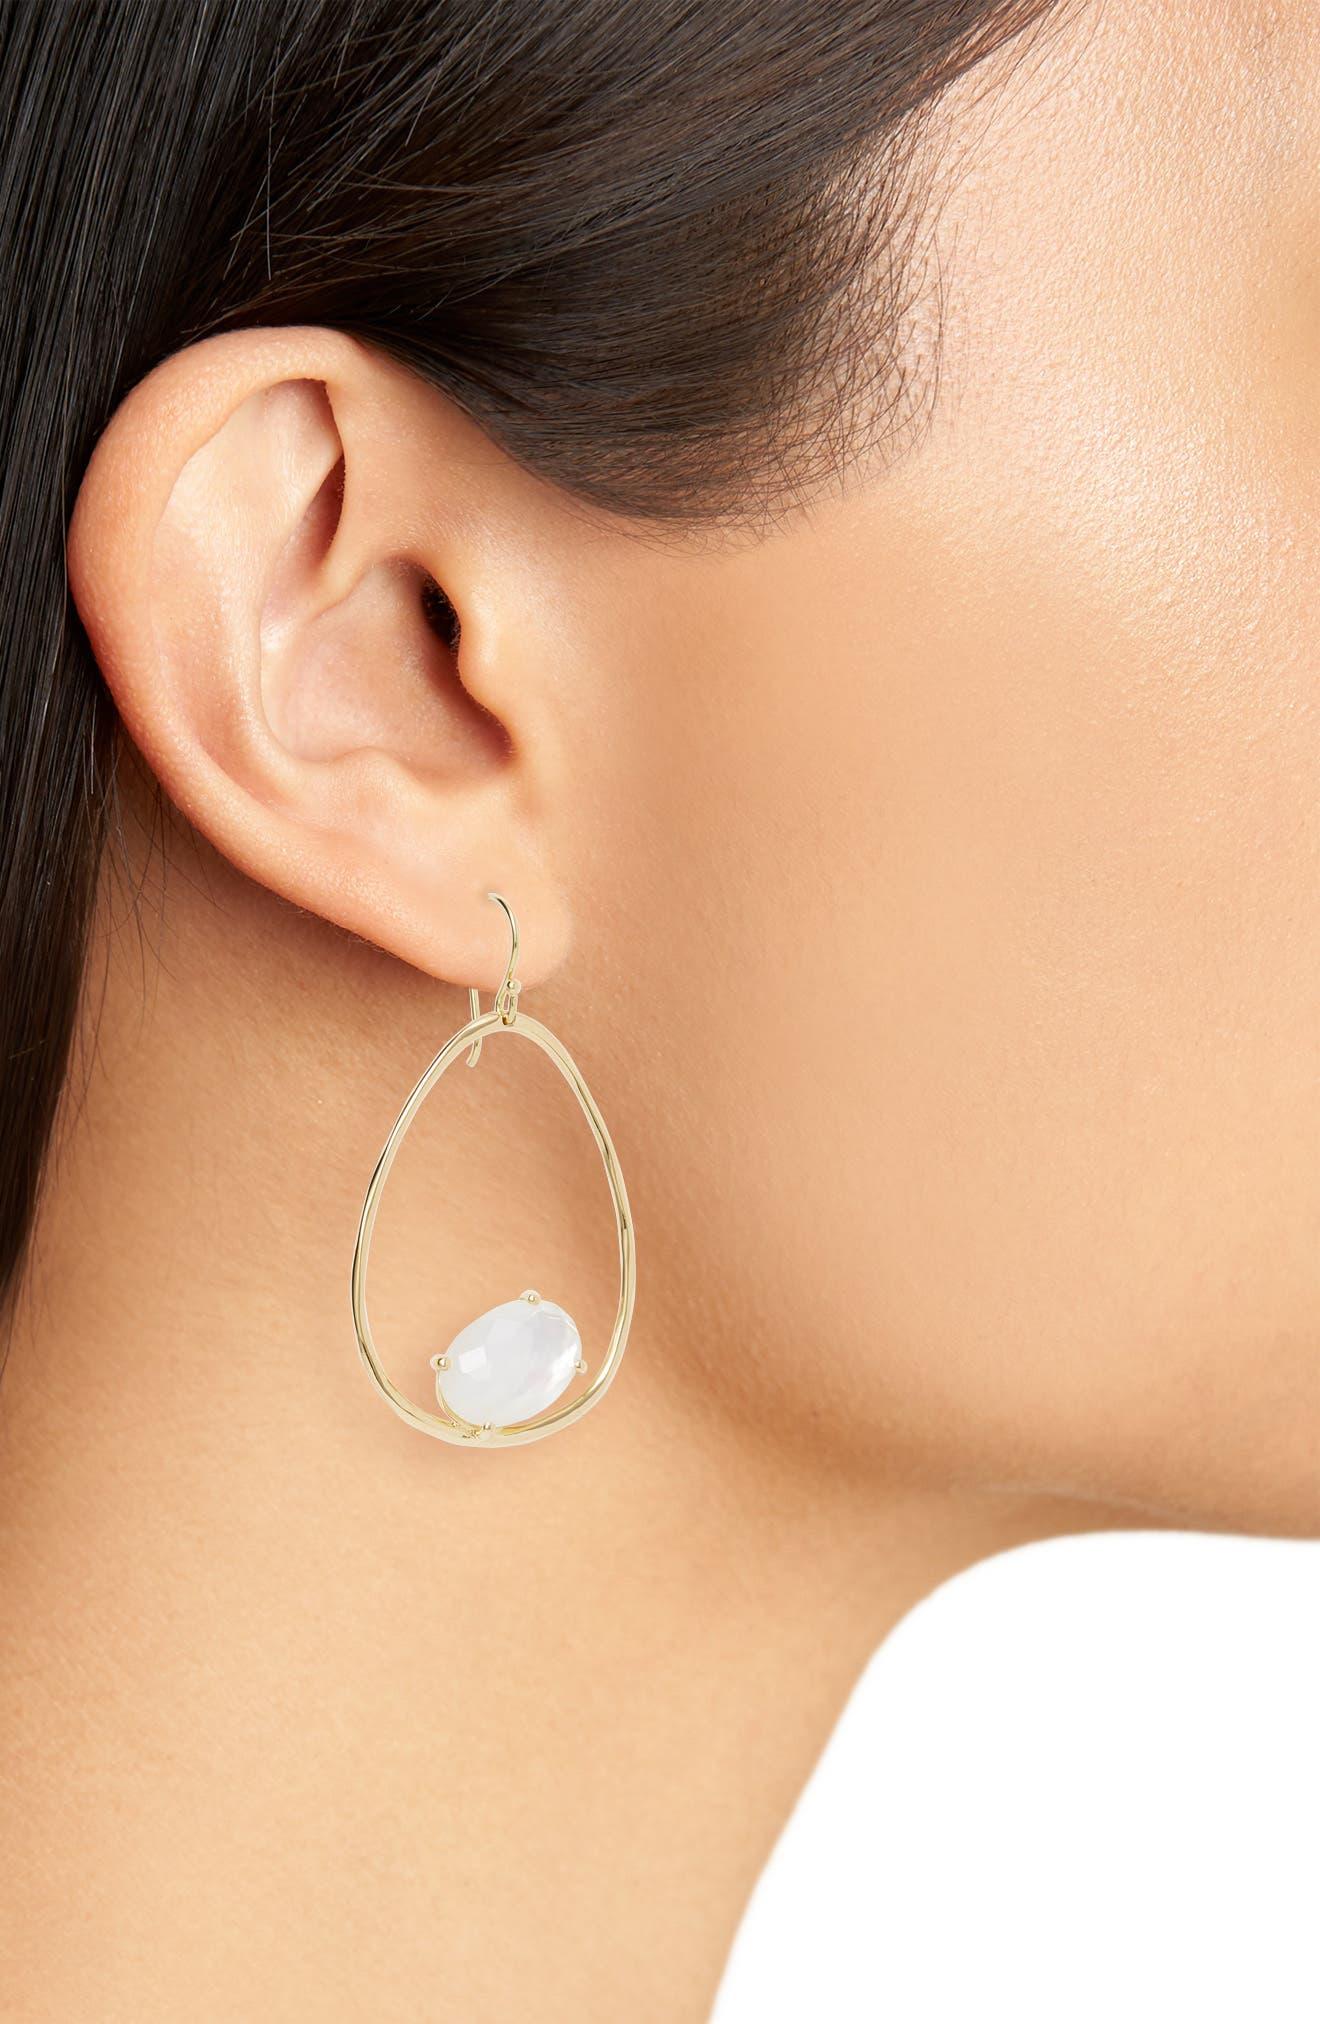 Rock Candy 18K Gold Large Drop Earrings,                             Alternate thumbnail 2, color,                             106